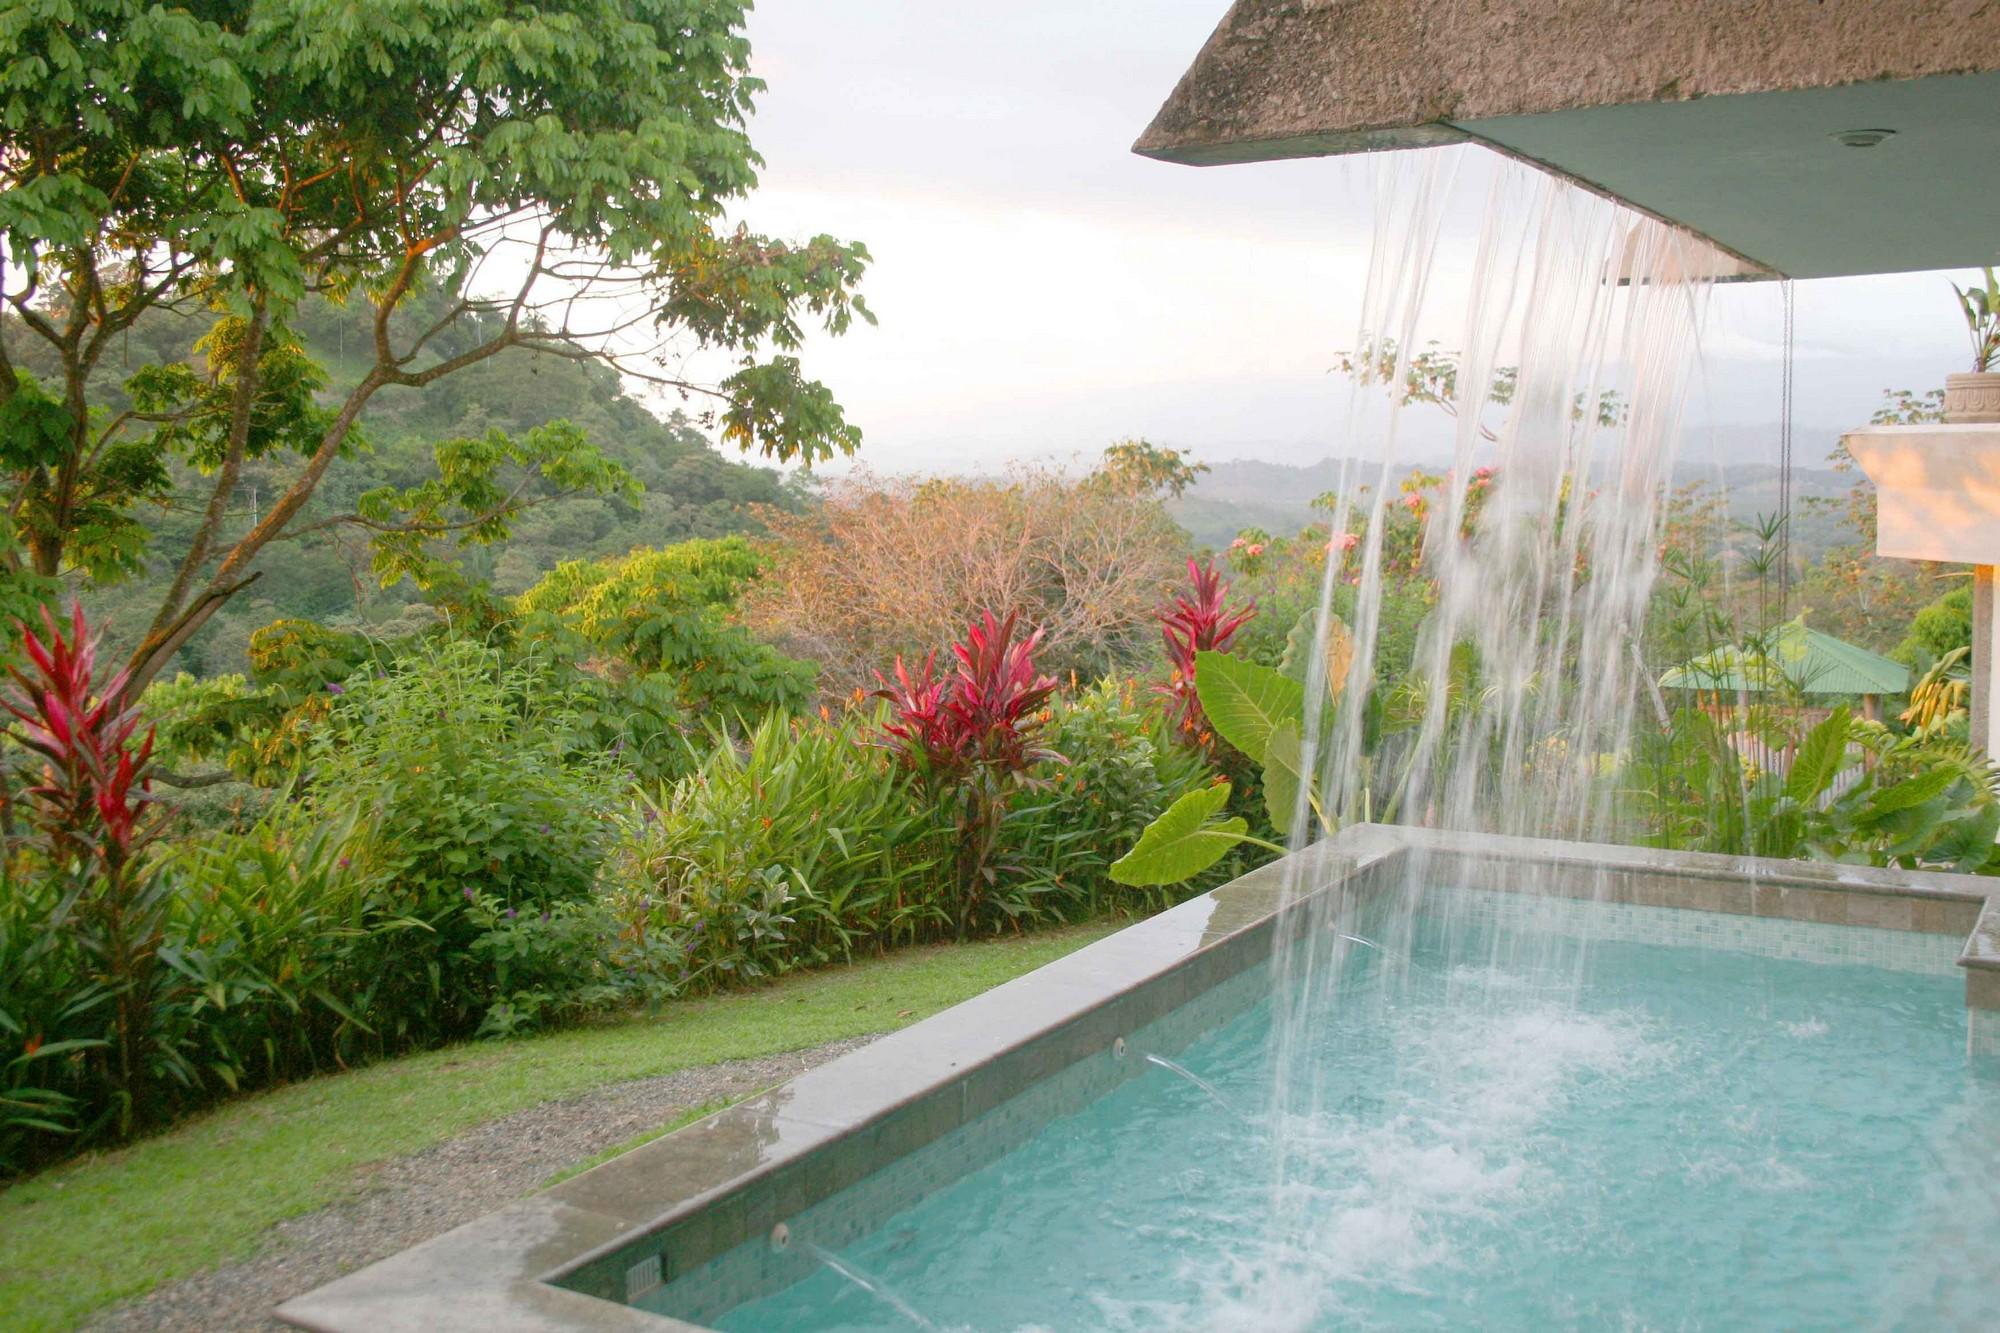 Casa de las Cascadas, Manuel Antonio, Costa Rica The waterfall and lower pool